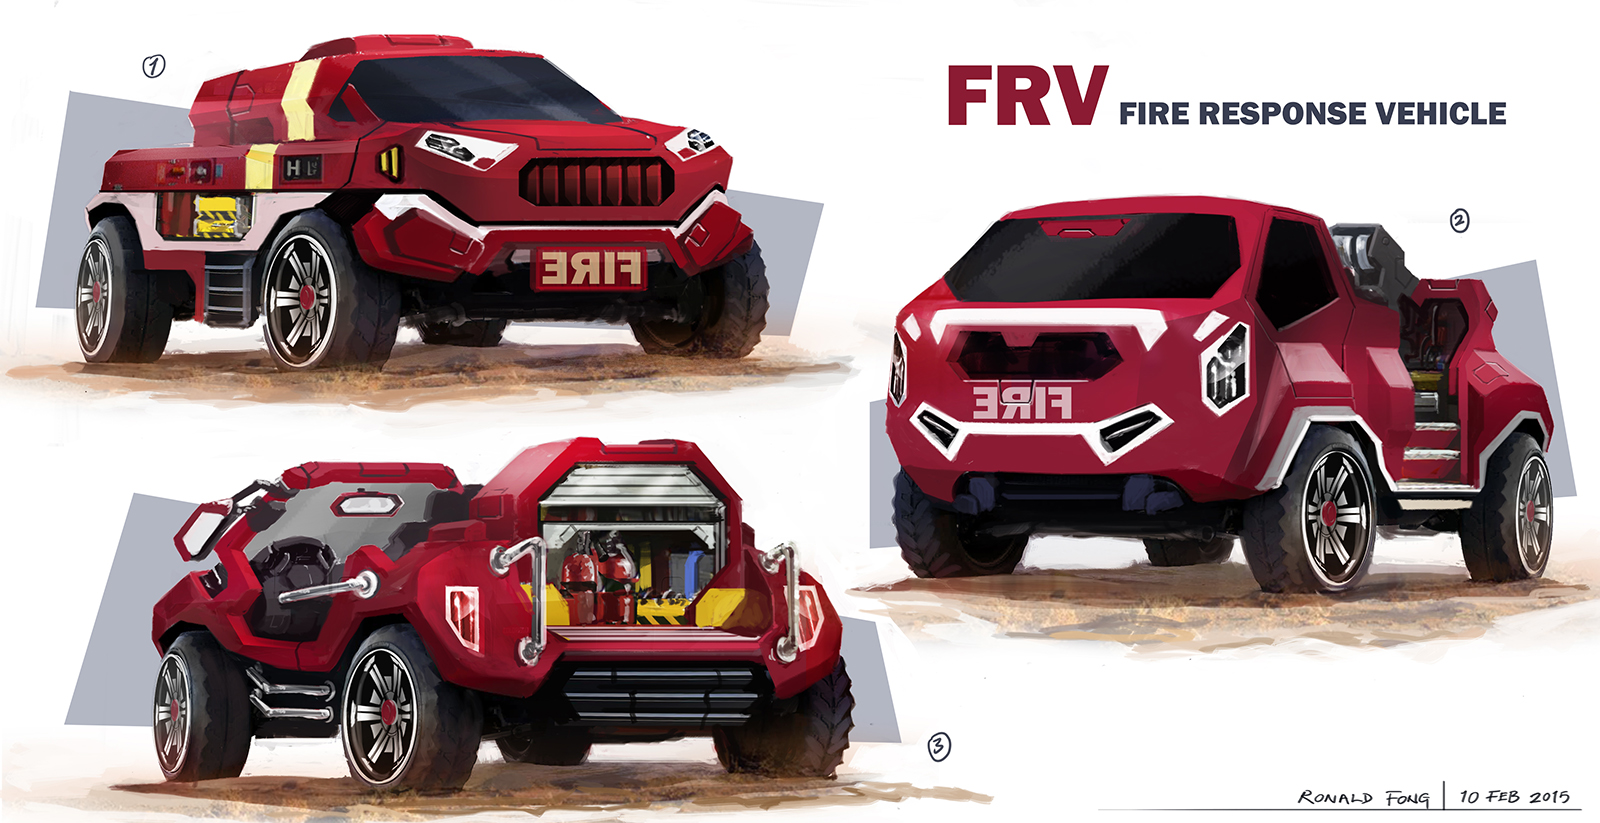 Ronald Fong Fire Response Vehicle Singapore